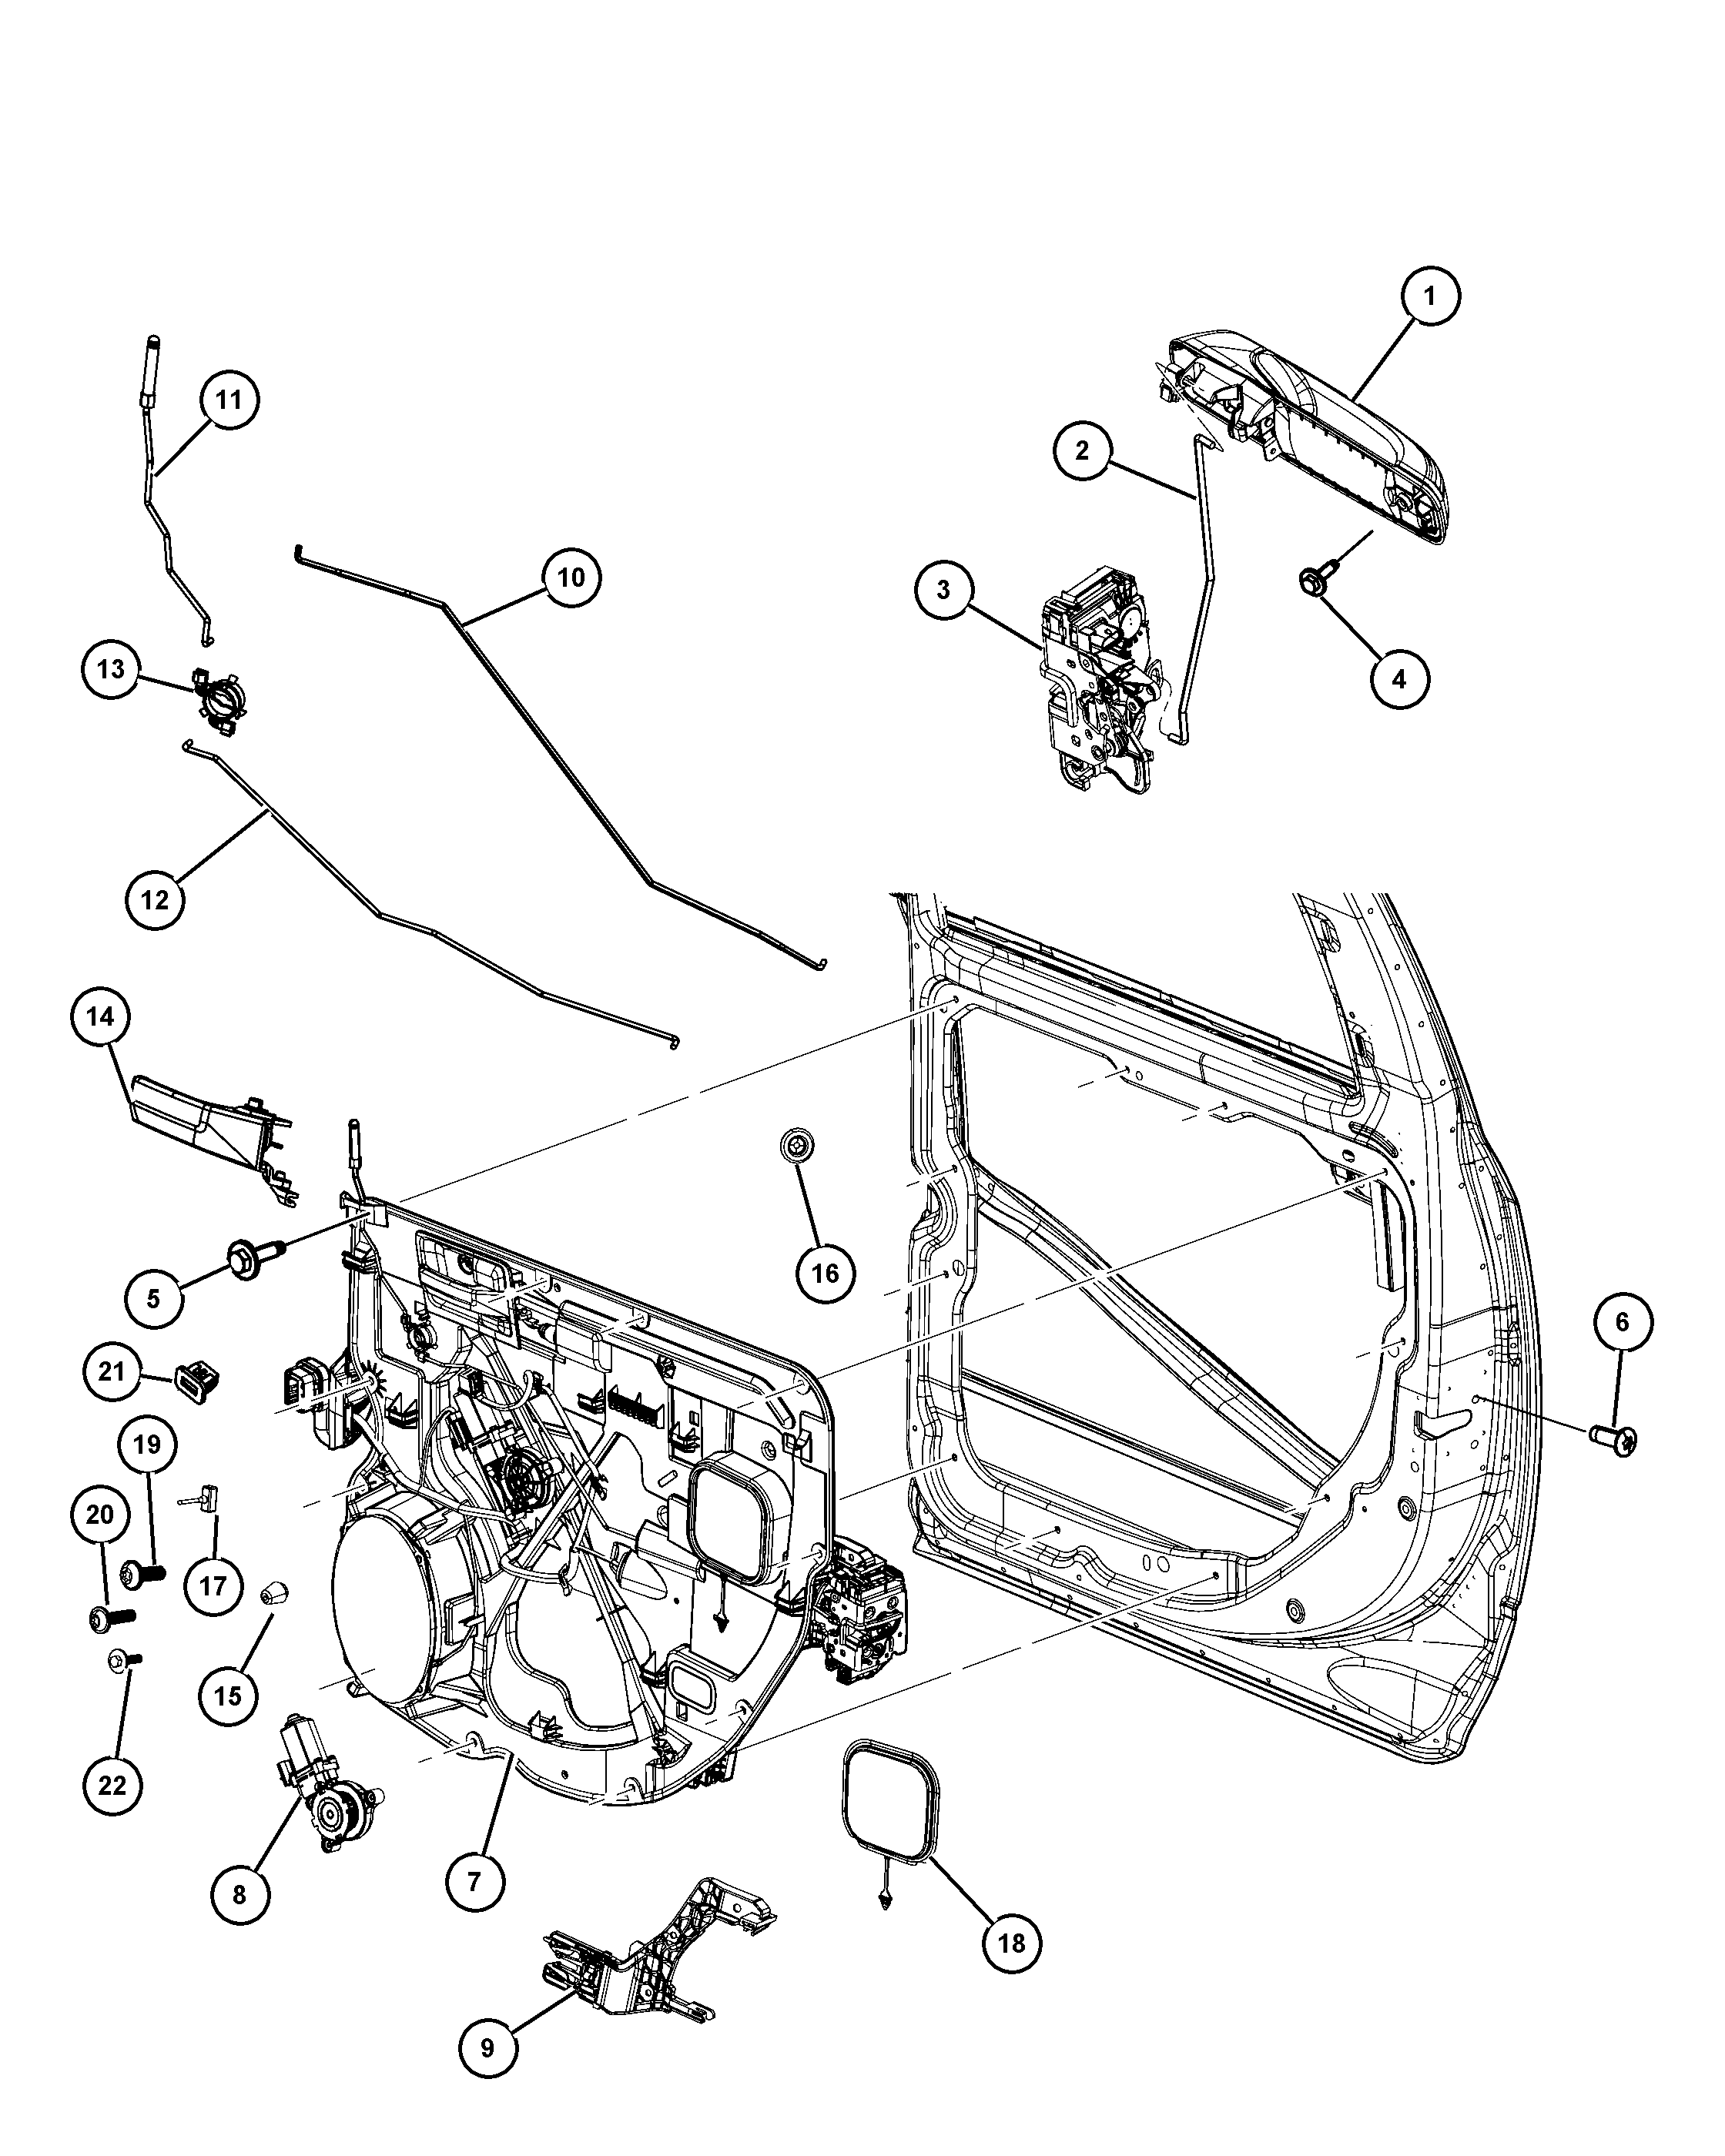 Автозапчасти: Ram 1500 225 Exhaust Diagram At Chusao.net